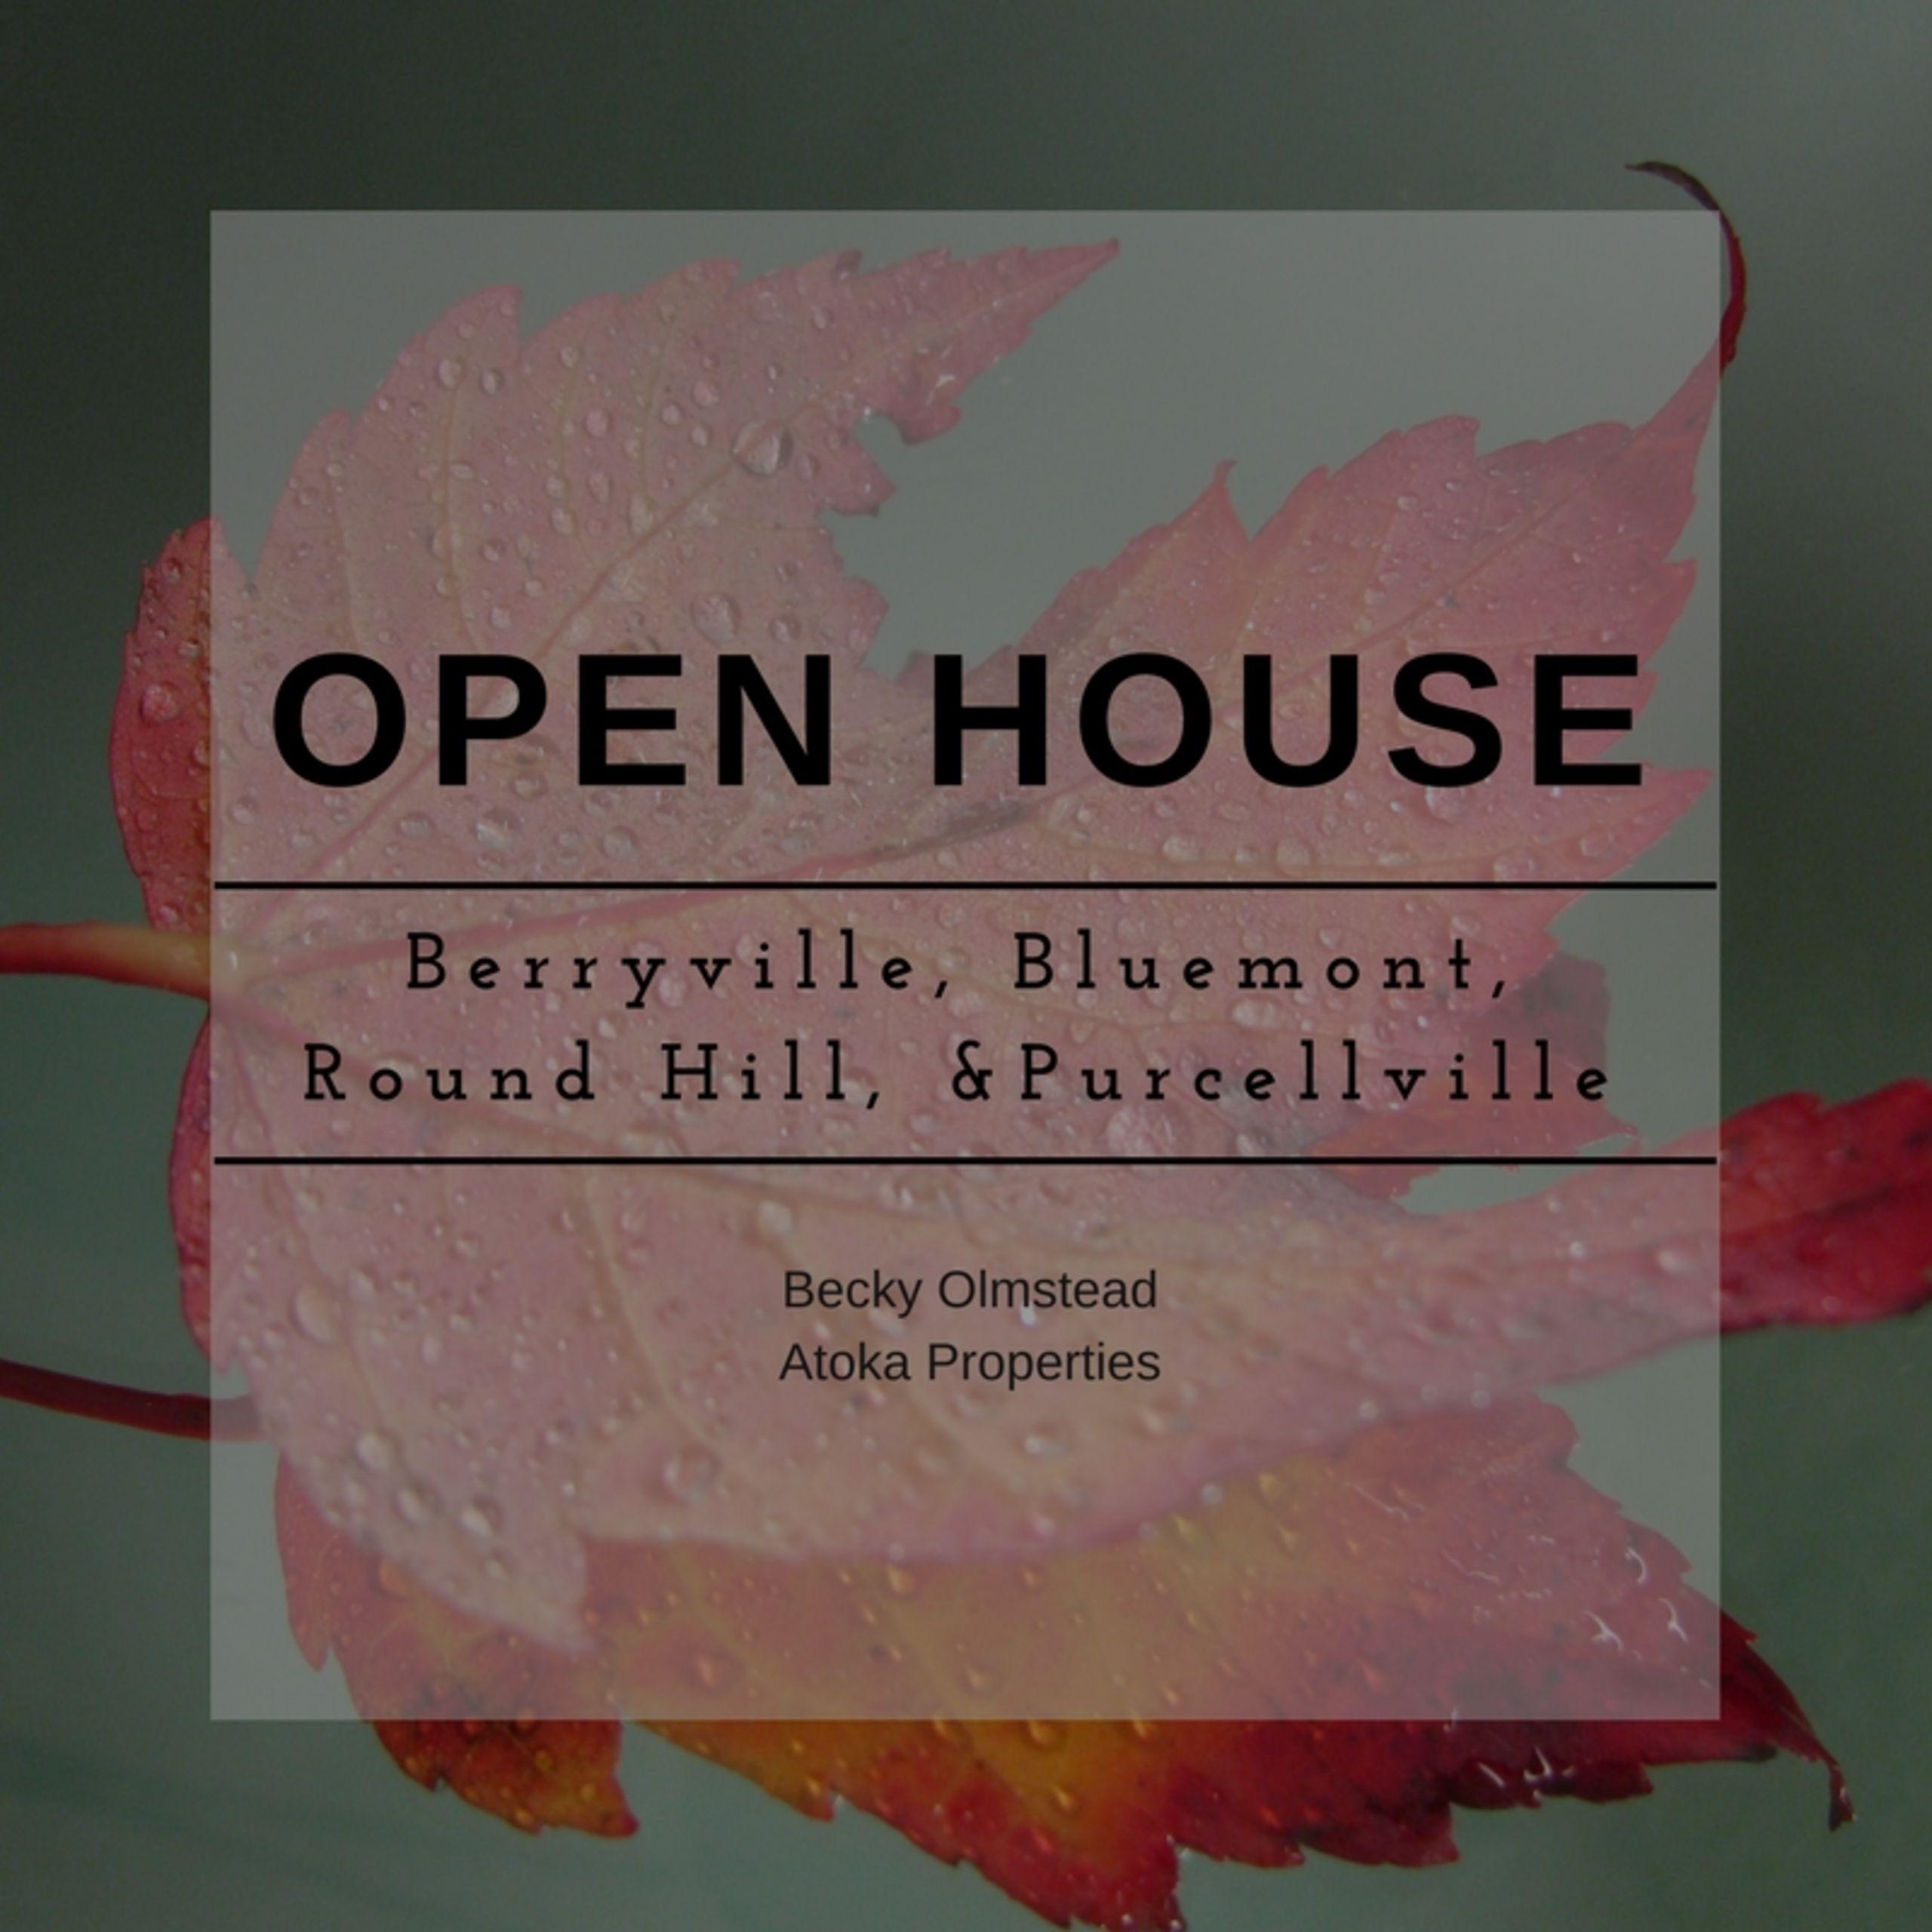 November 11 & 12 Open House